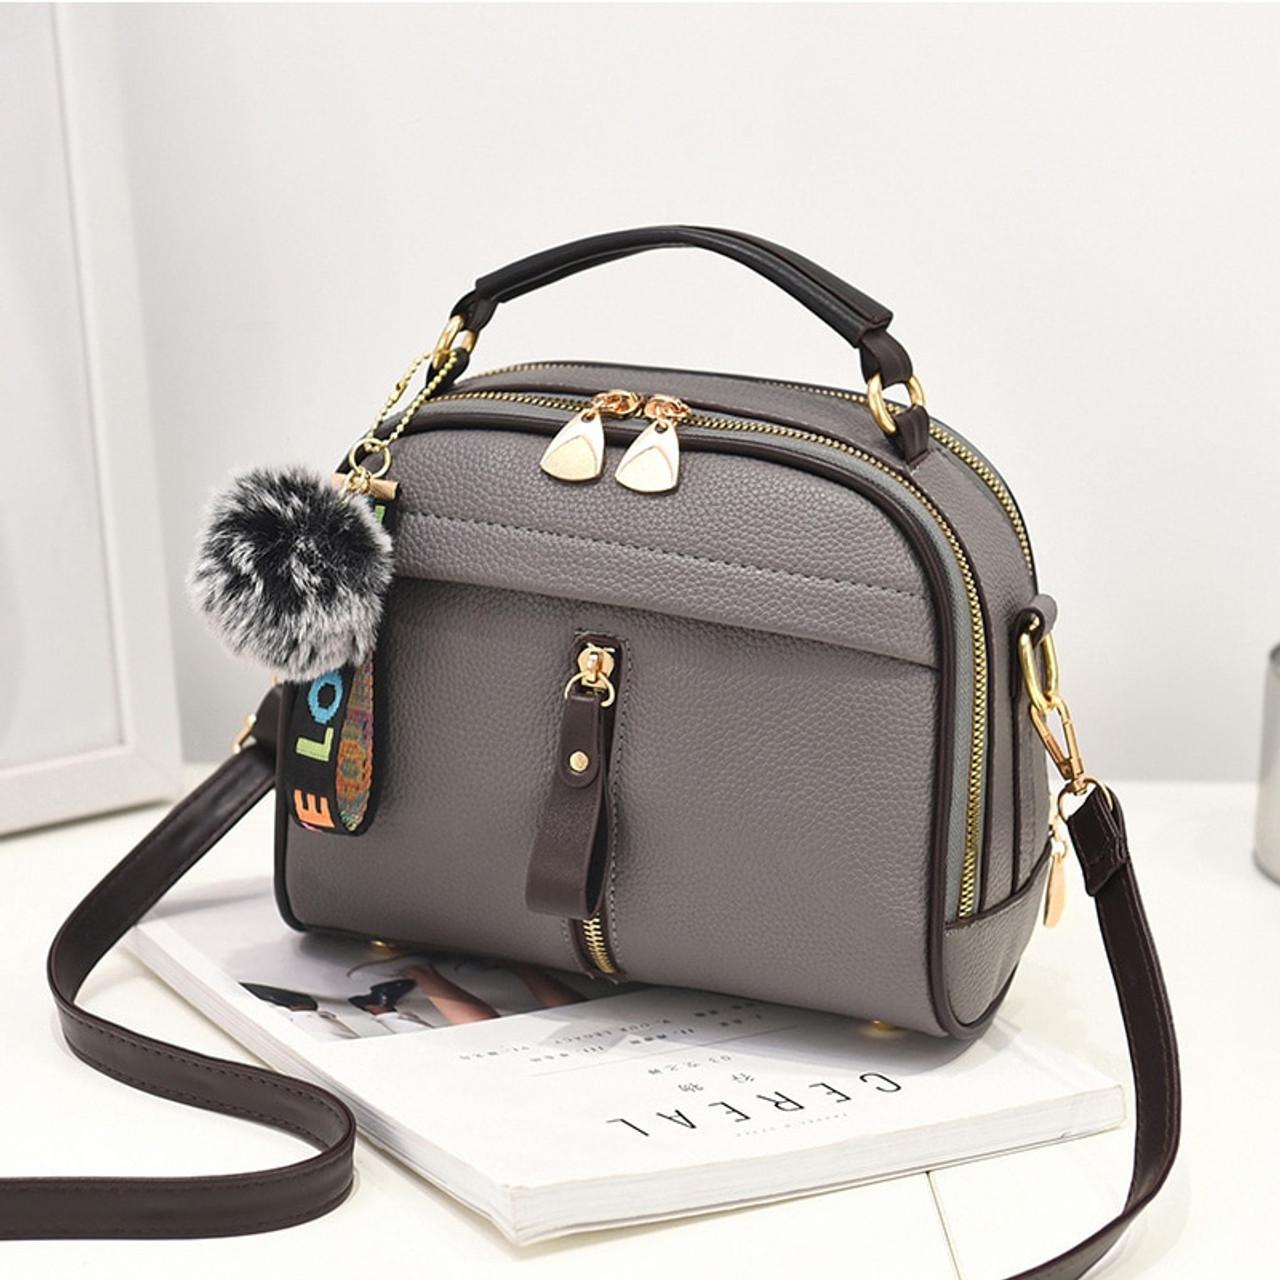 33fa051db15f New Crossbody Bags For Women 2018 Handbag Shoulder Bag Female Leather Flap  Cheap Women Messenger Bags Small Bolsa Feminina - OnshopDeals.Com